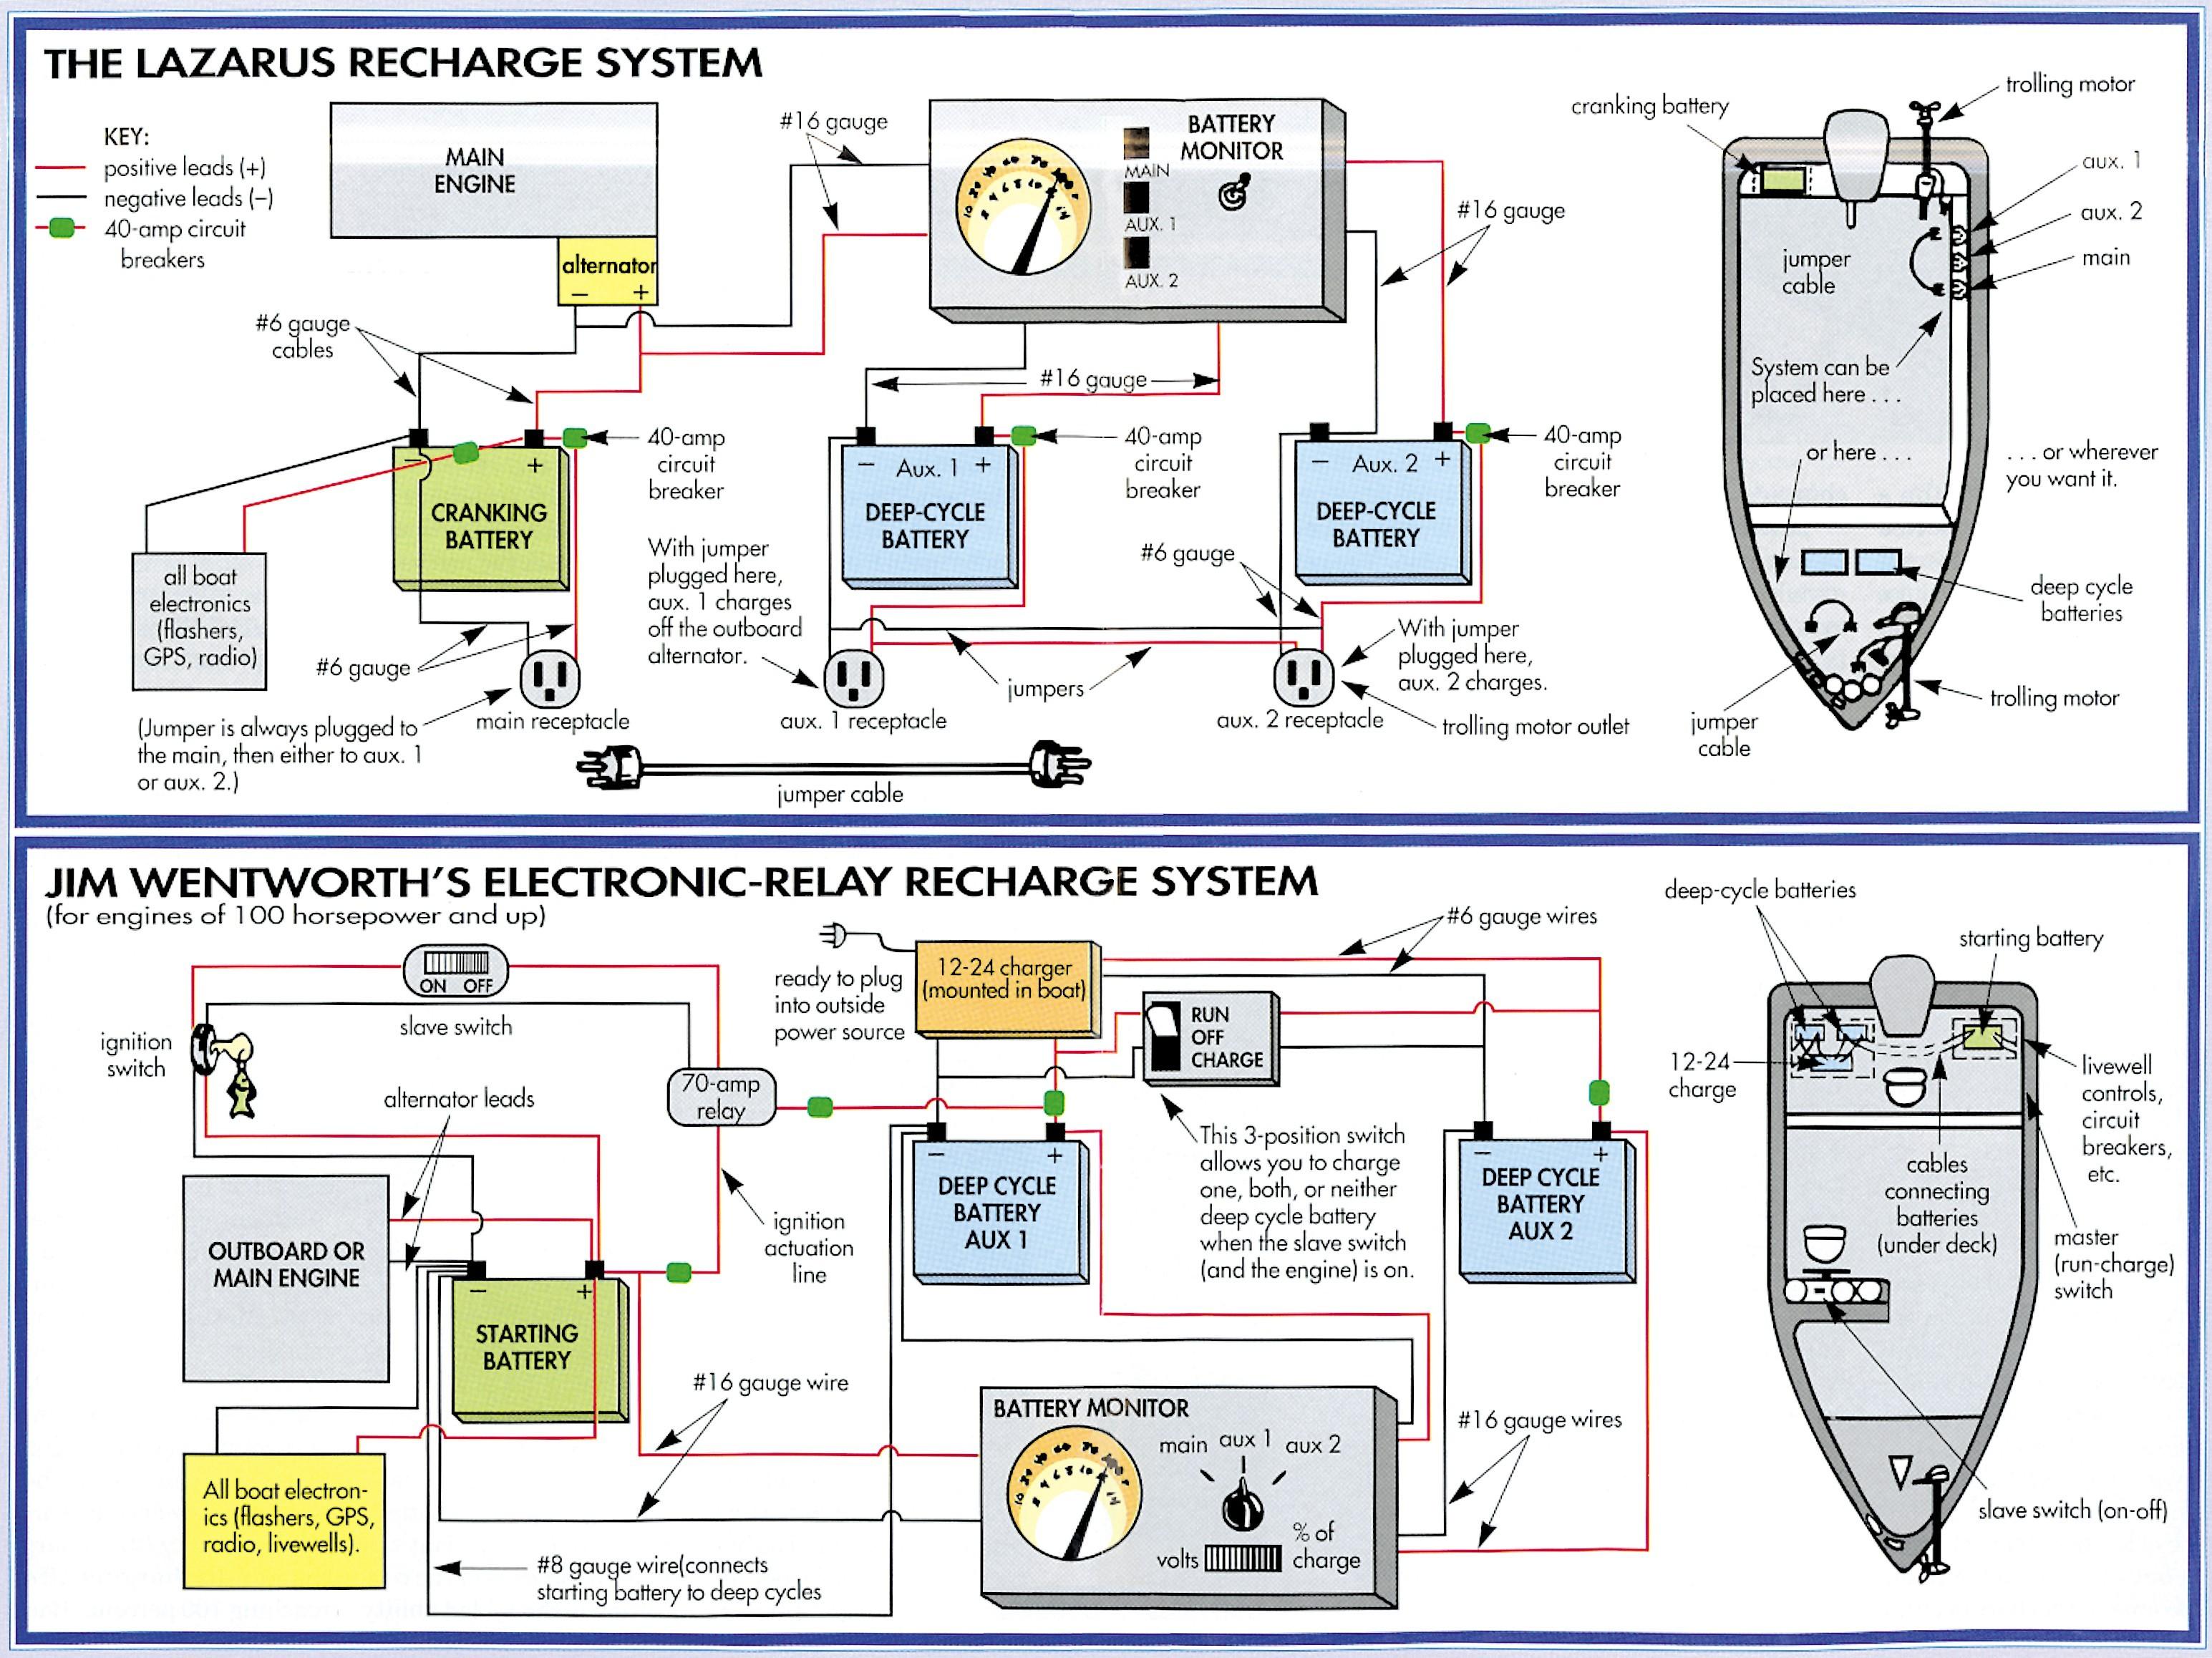 46E Boat Bus Bar Wiring Diagram | Wiring ResourcesWiring Resources